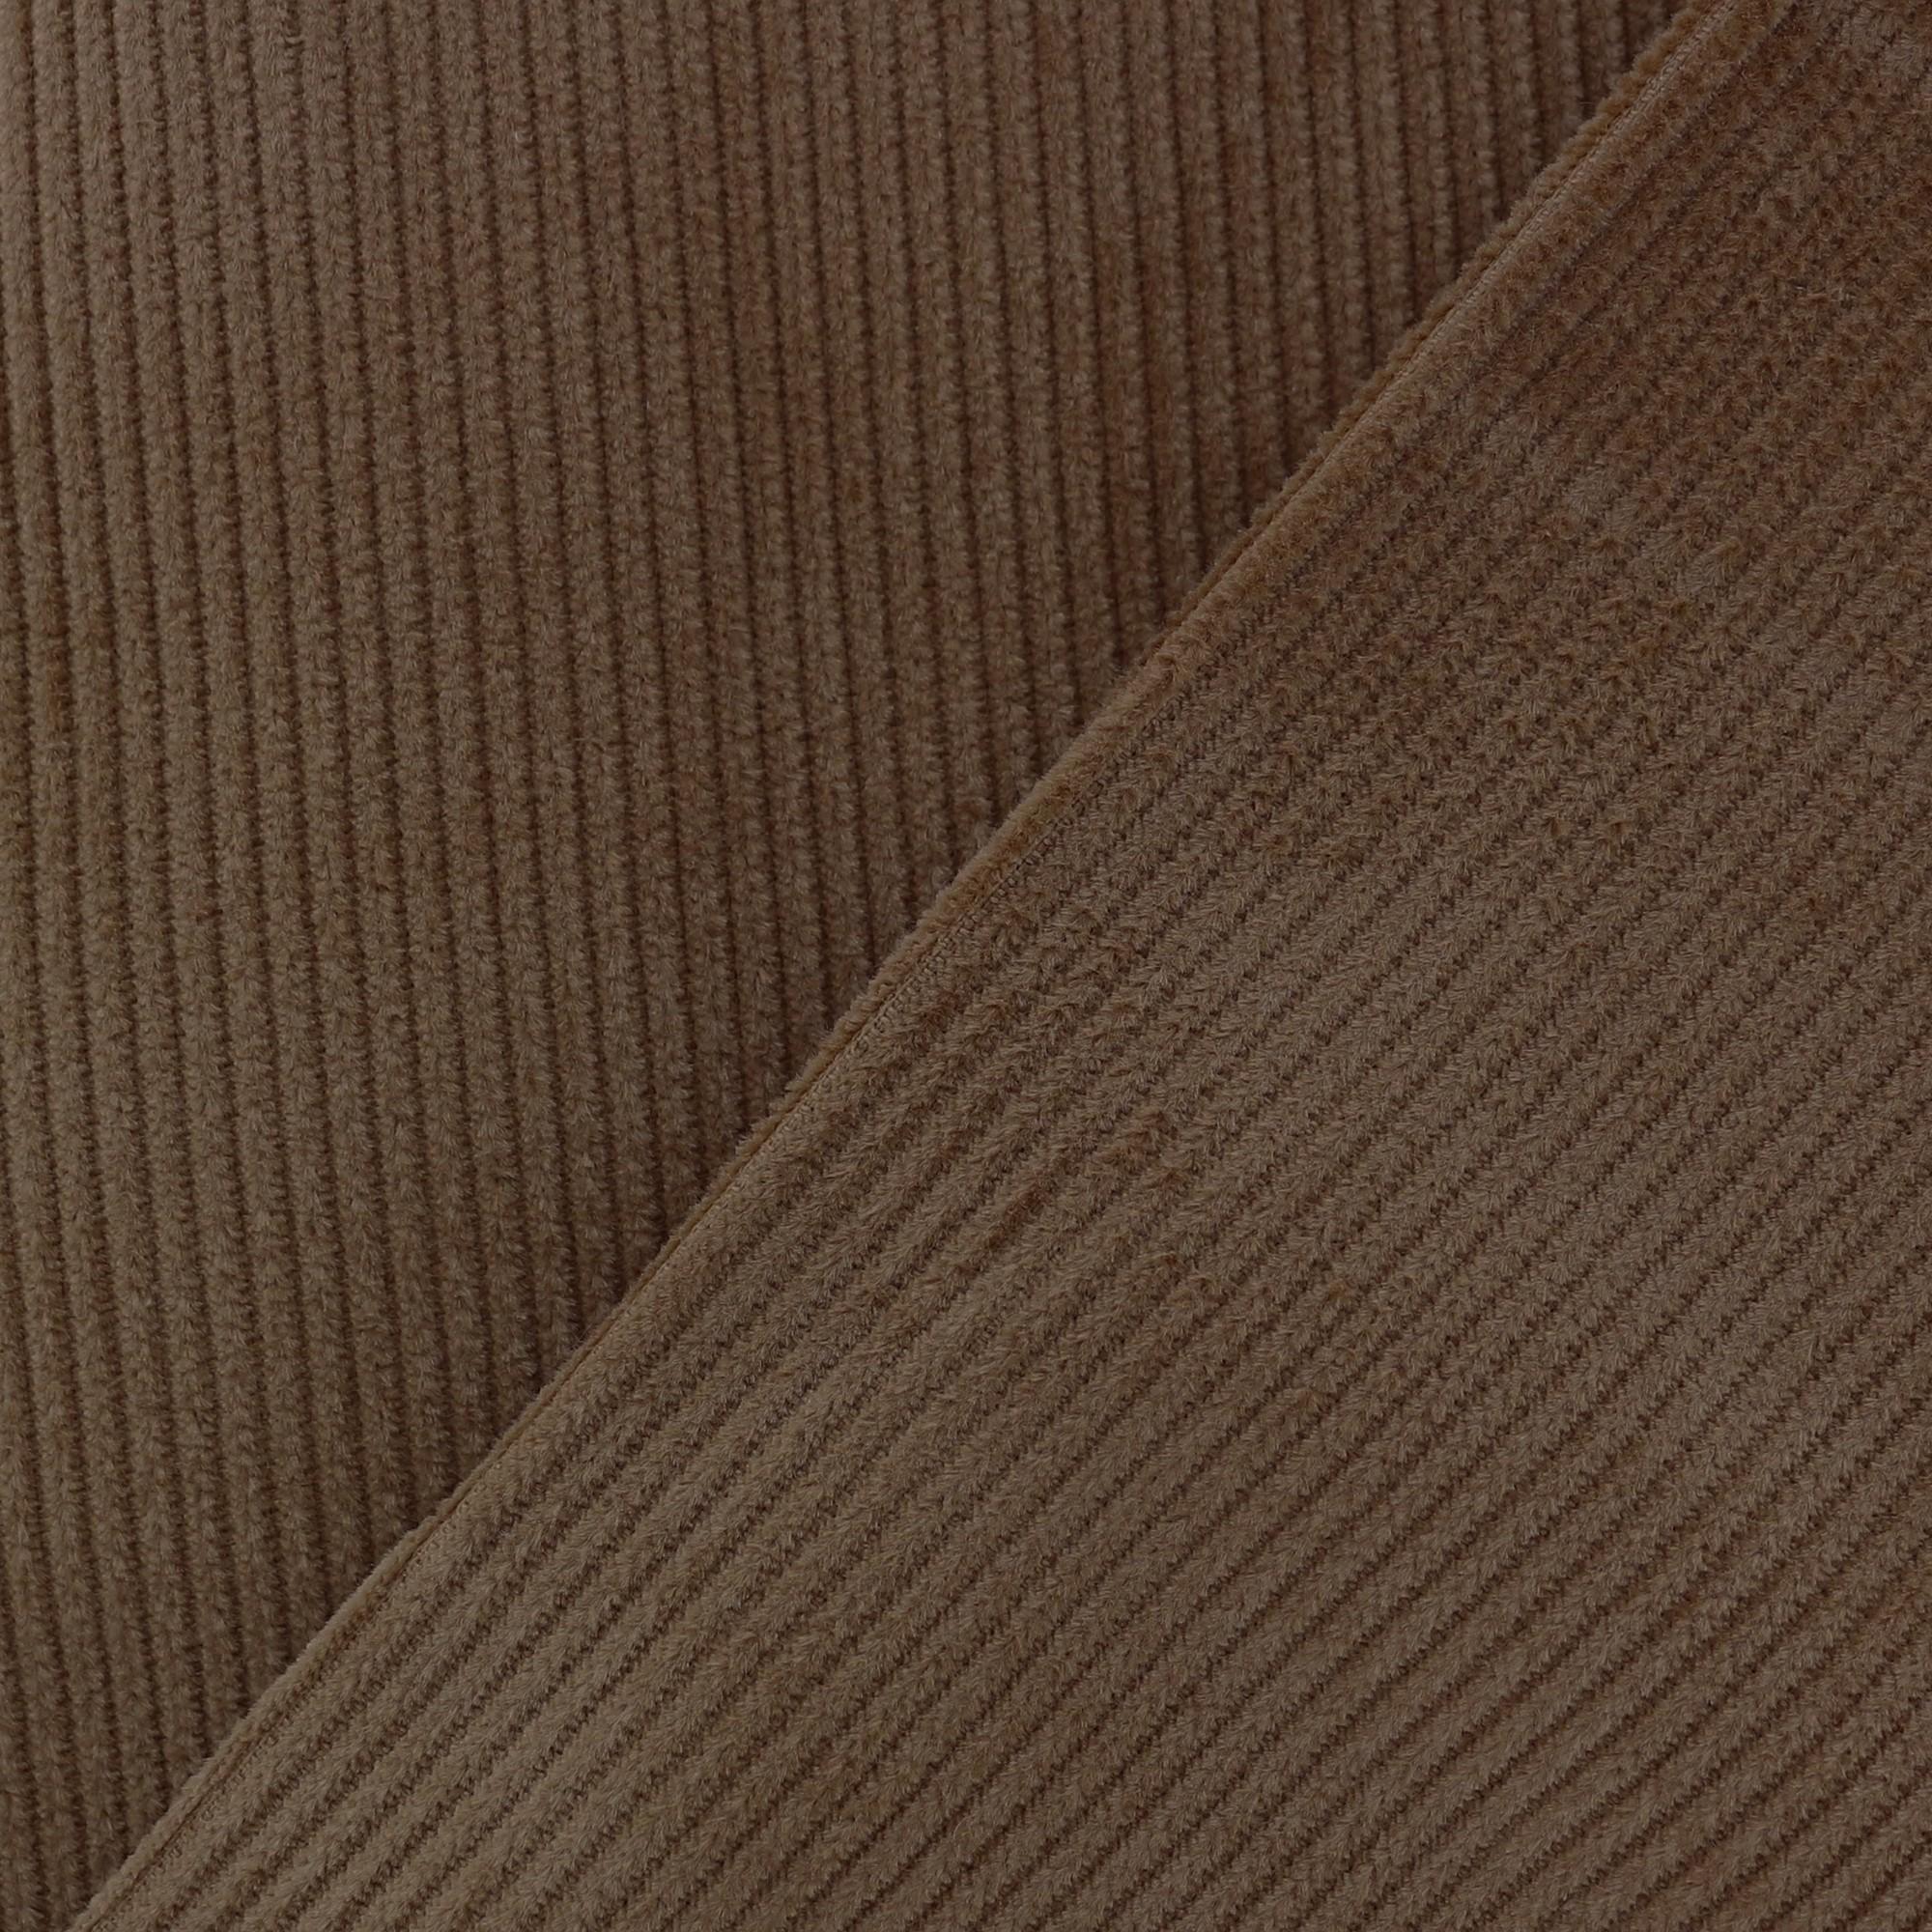 Tissu 500 Chocolat X10cm Velours Raies JF15ulKTc3